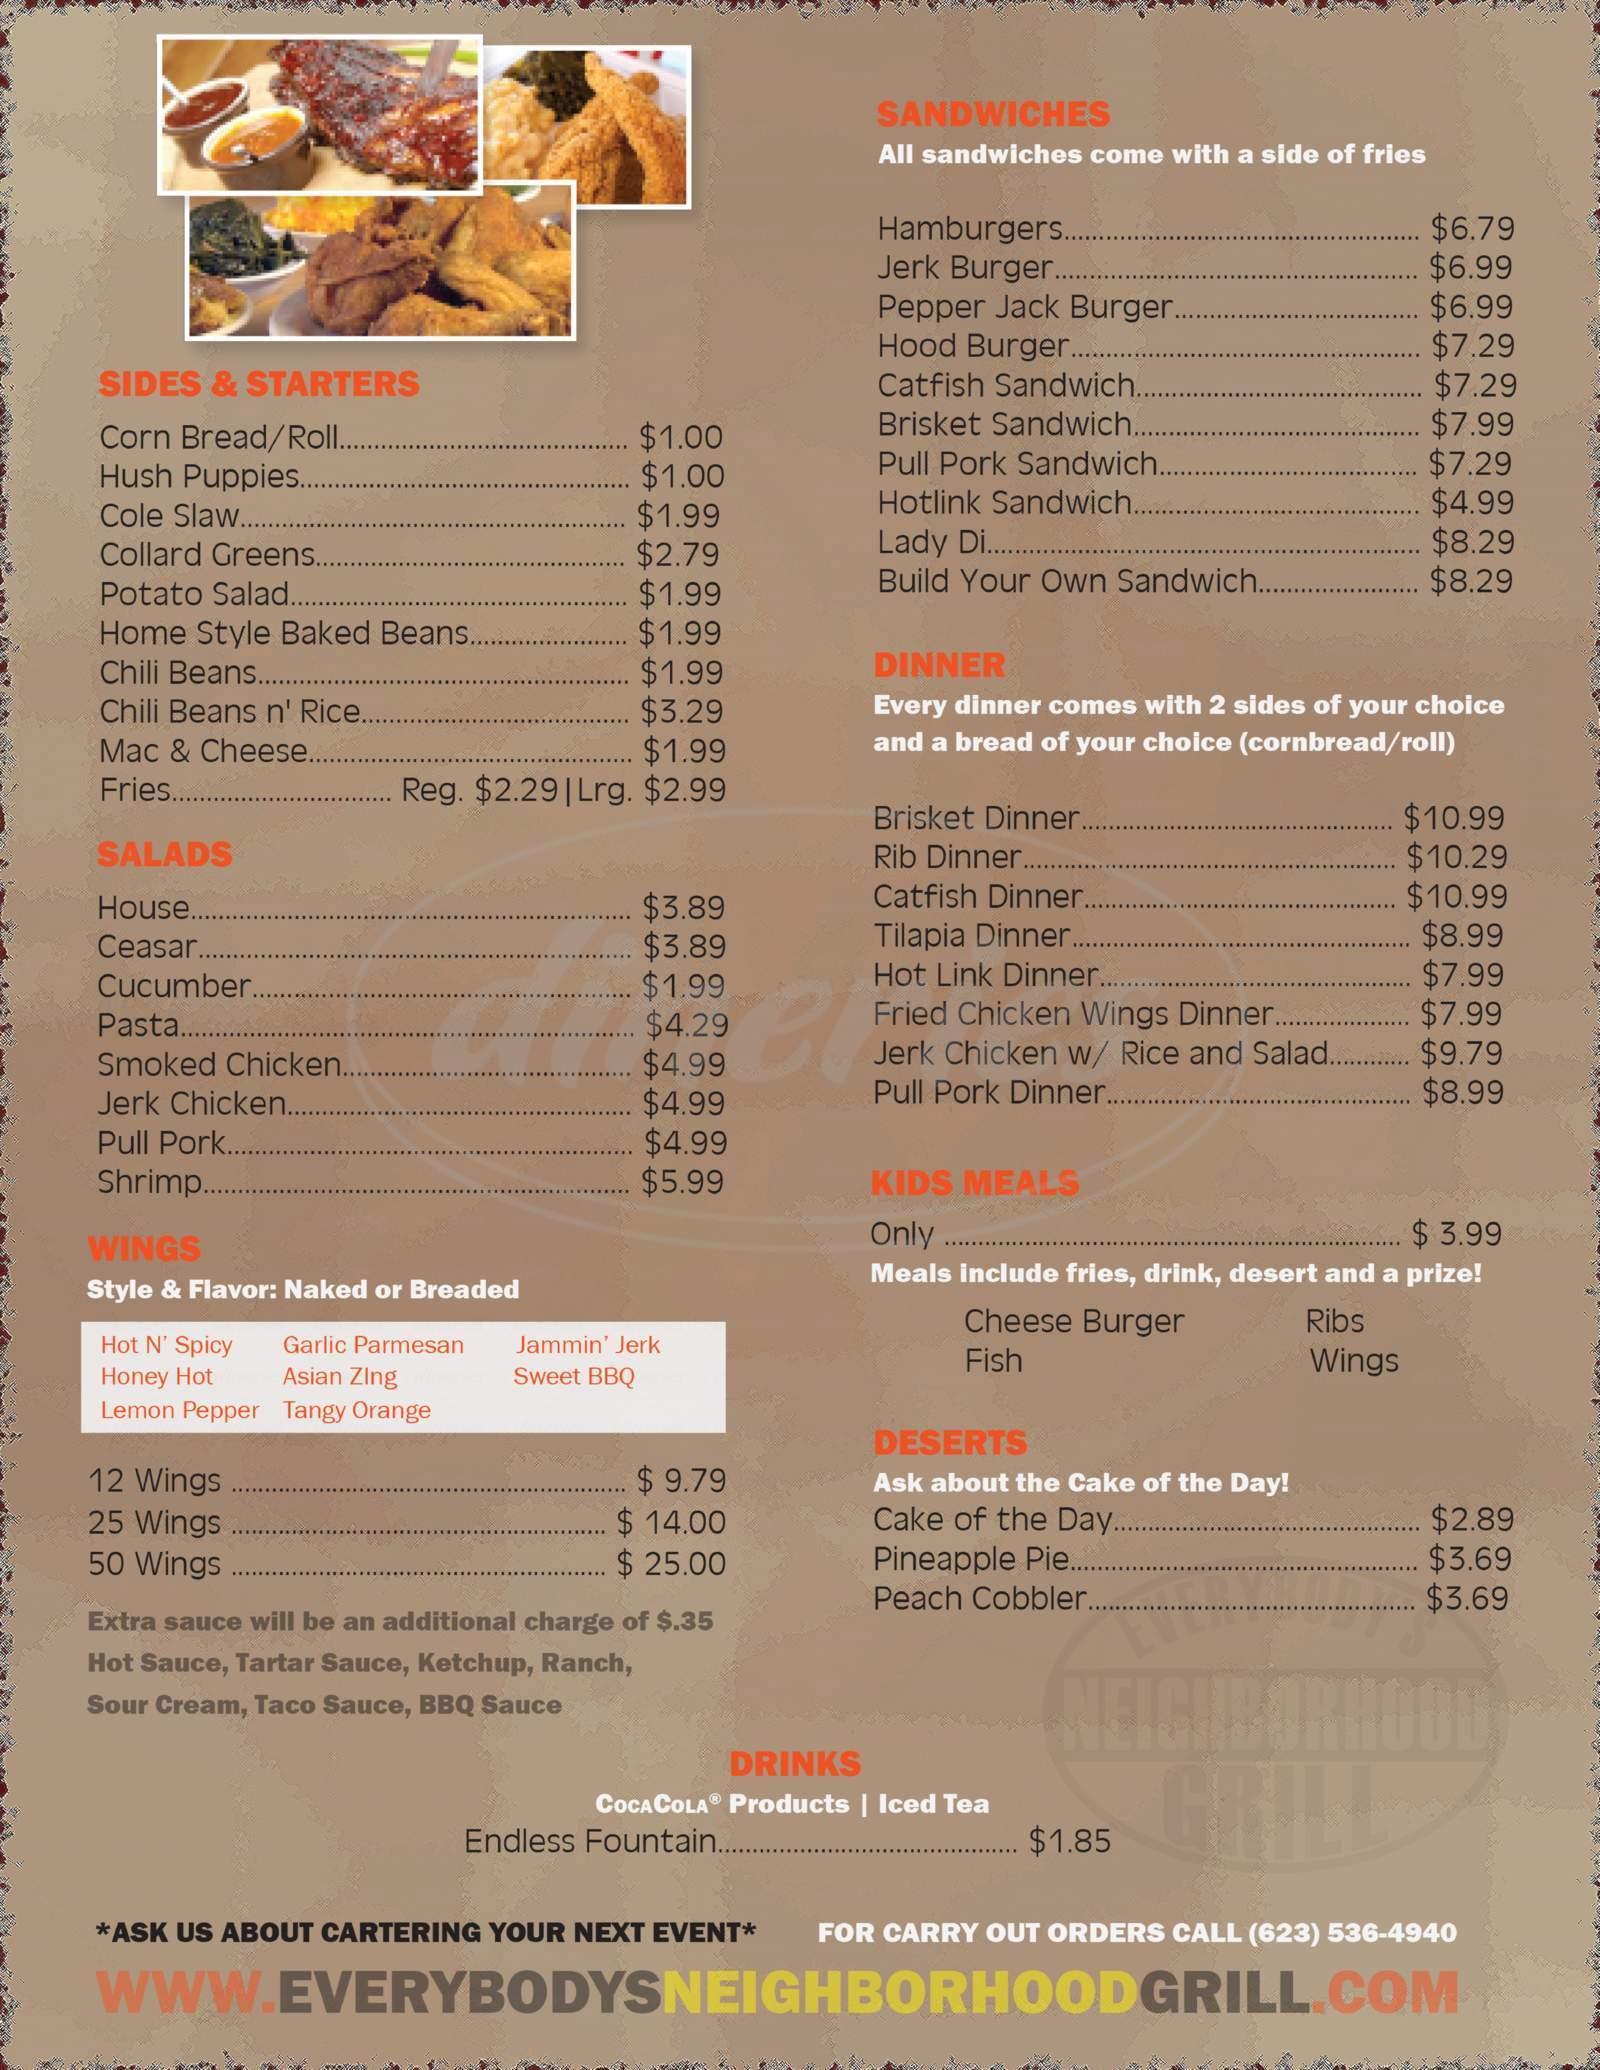 menu for Everybody's Neighborhood Grill